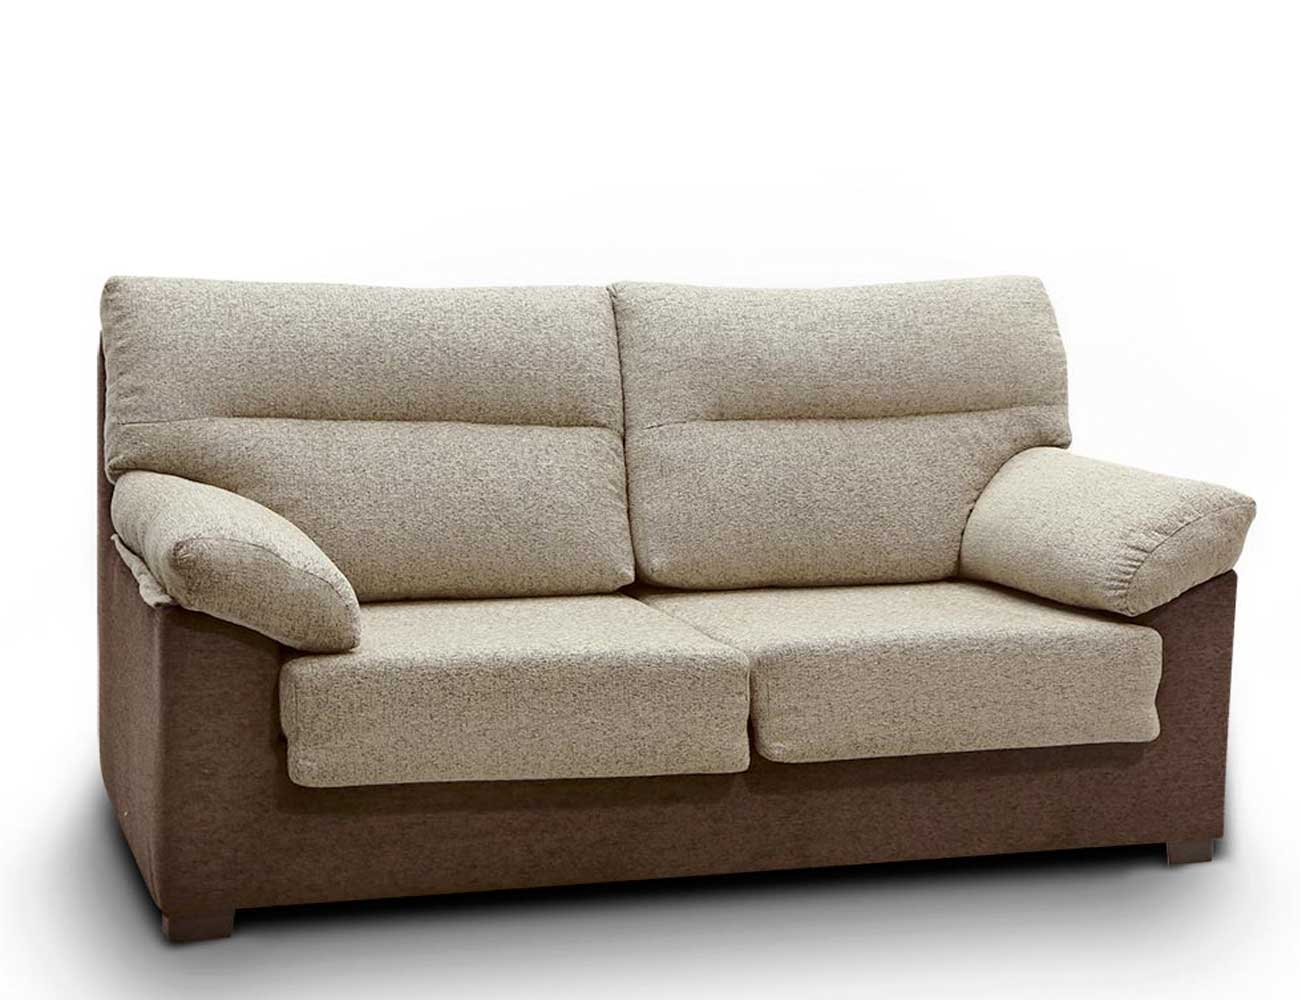 Sofa 3 plazas barato7